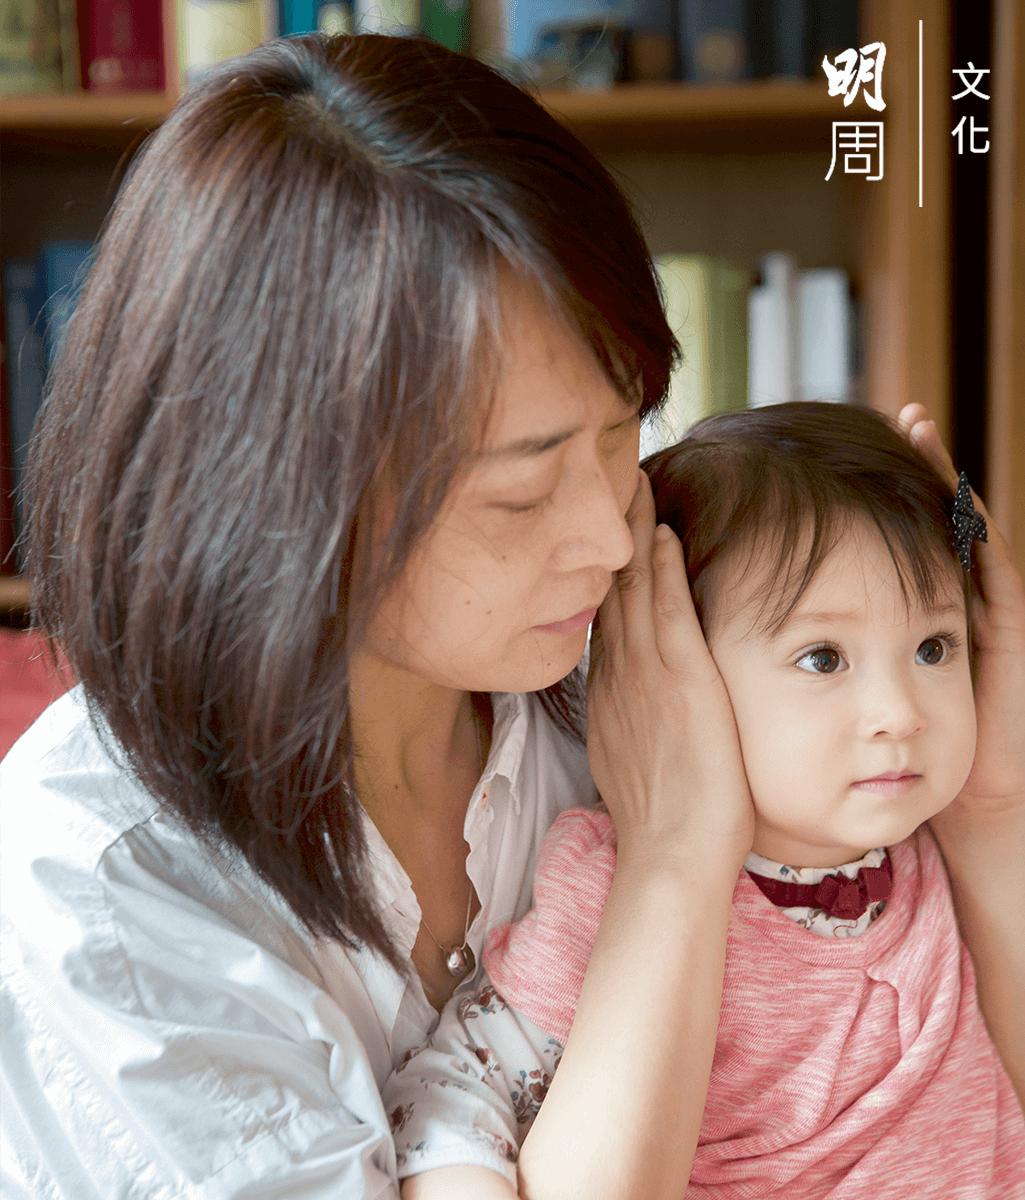 Jie擔心噪音對孩子的成長造成重大影響